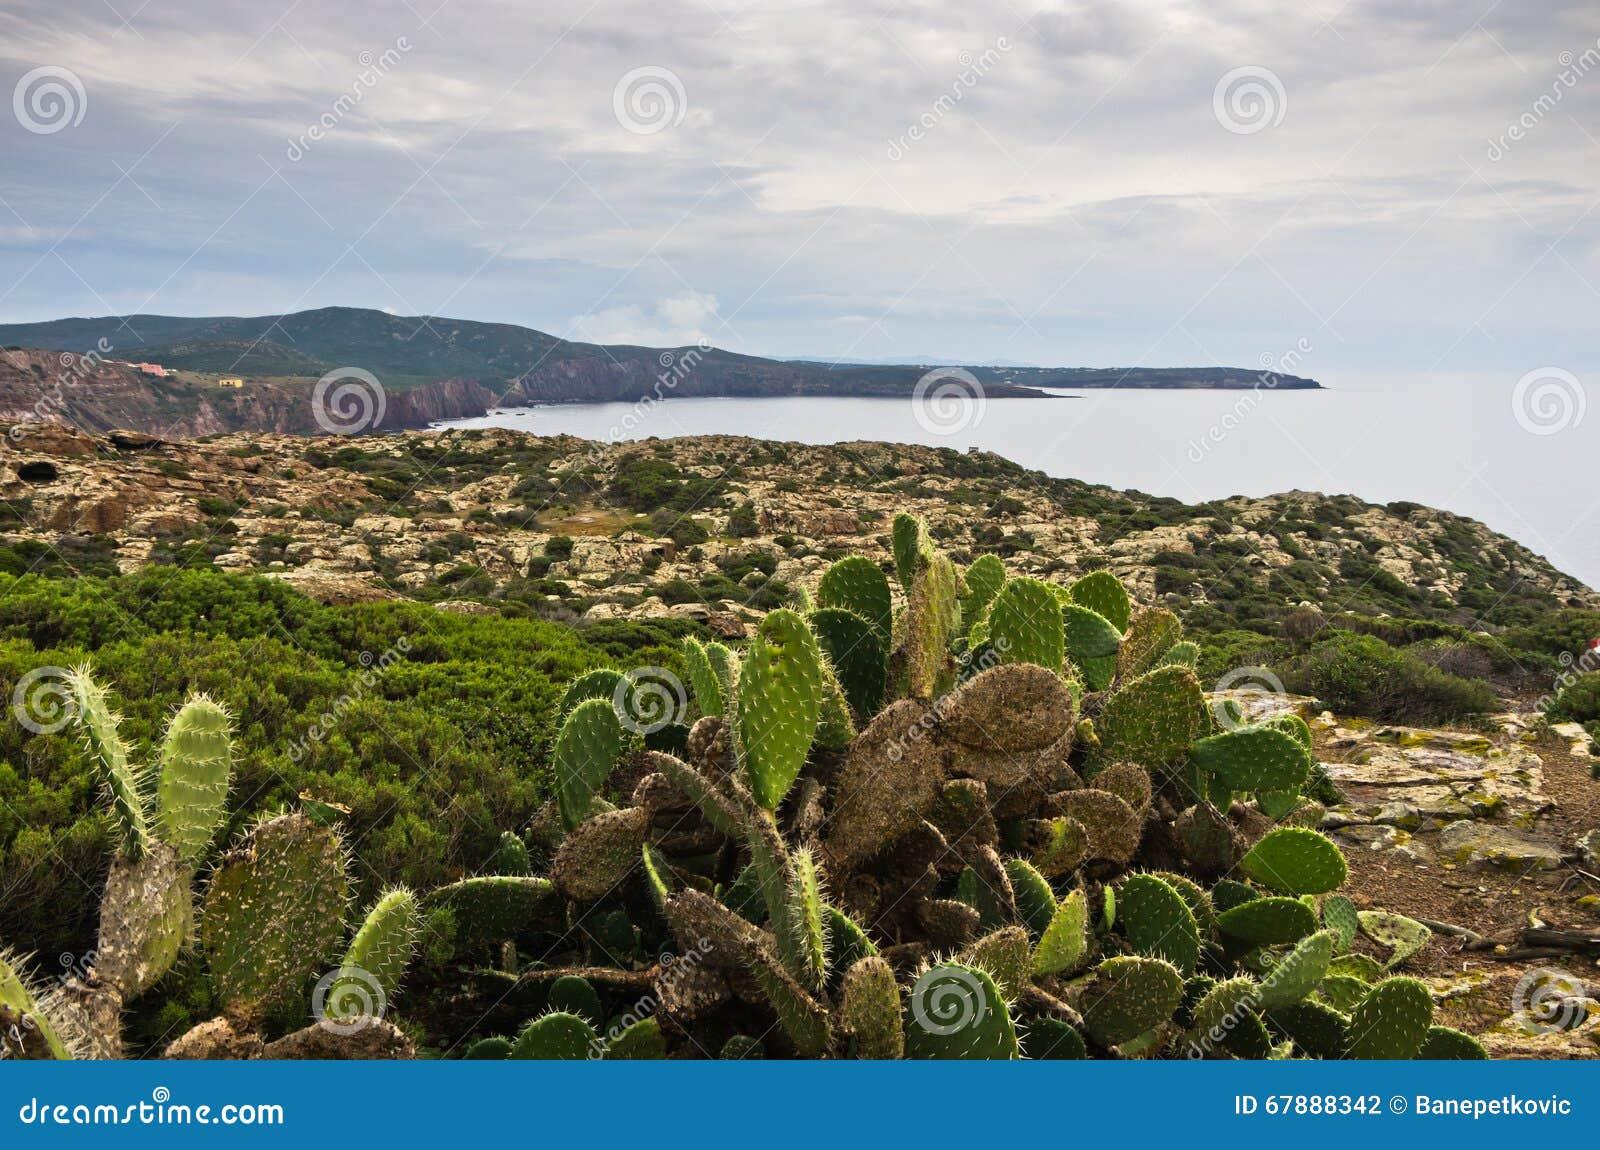 Plantas do cacto na costa oeste da ilha de San Pietro, Sardinia